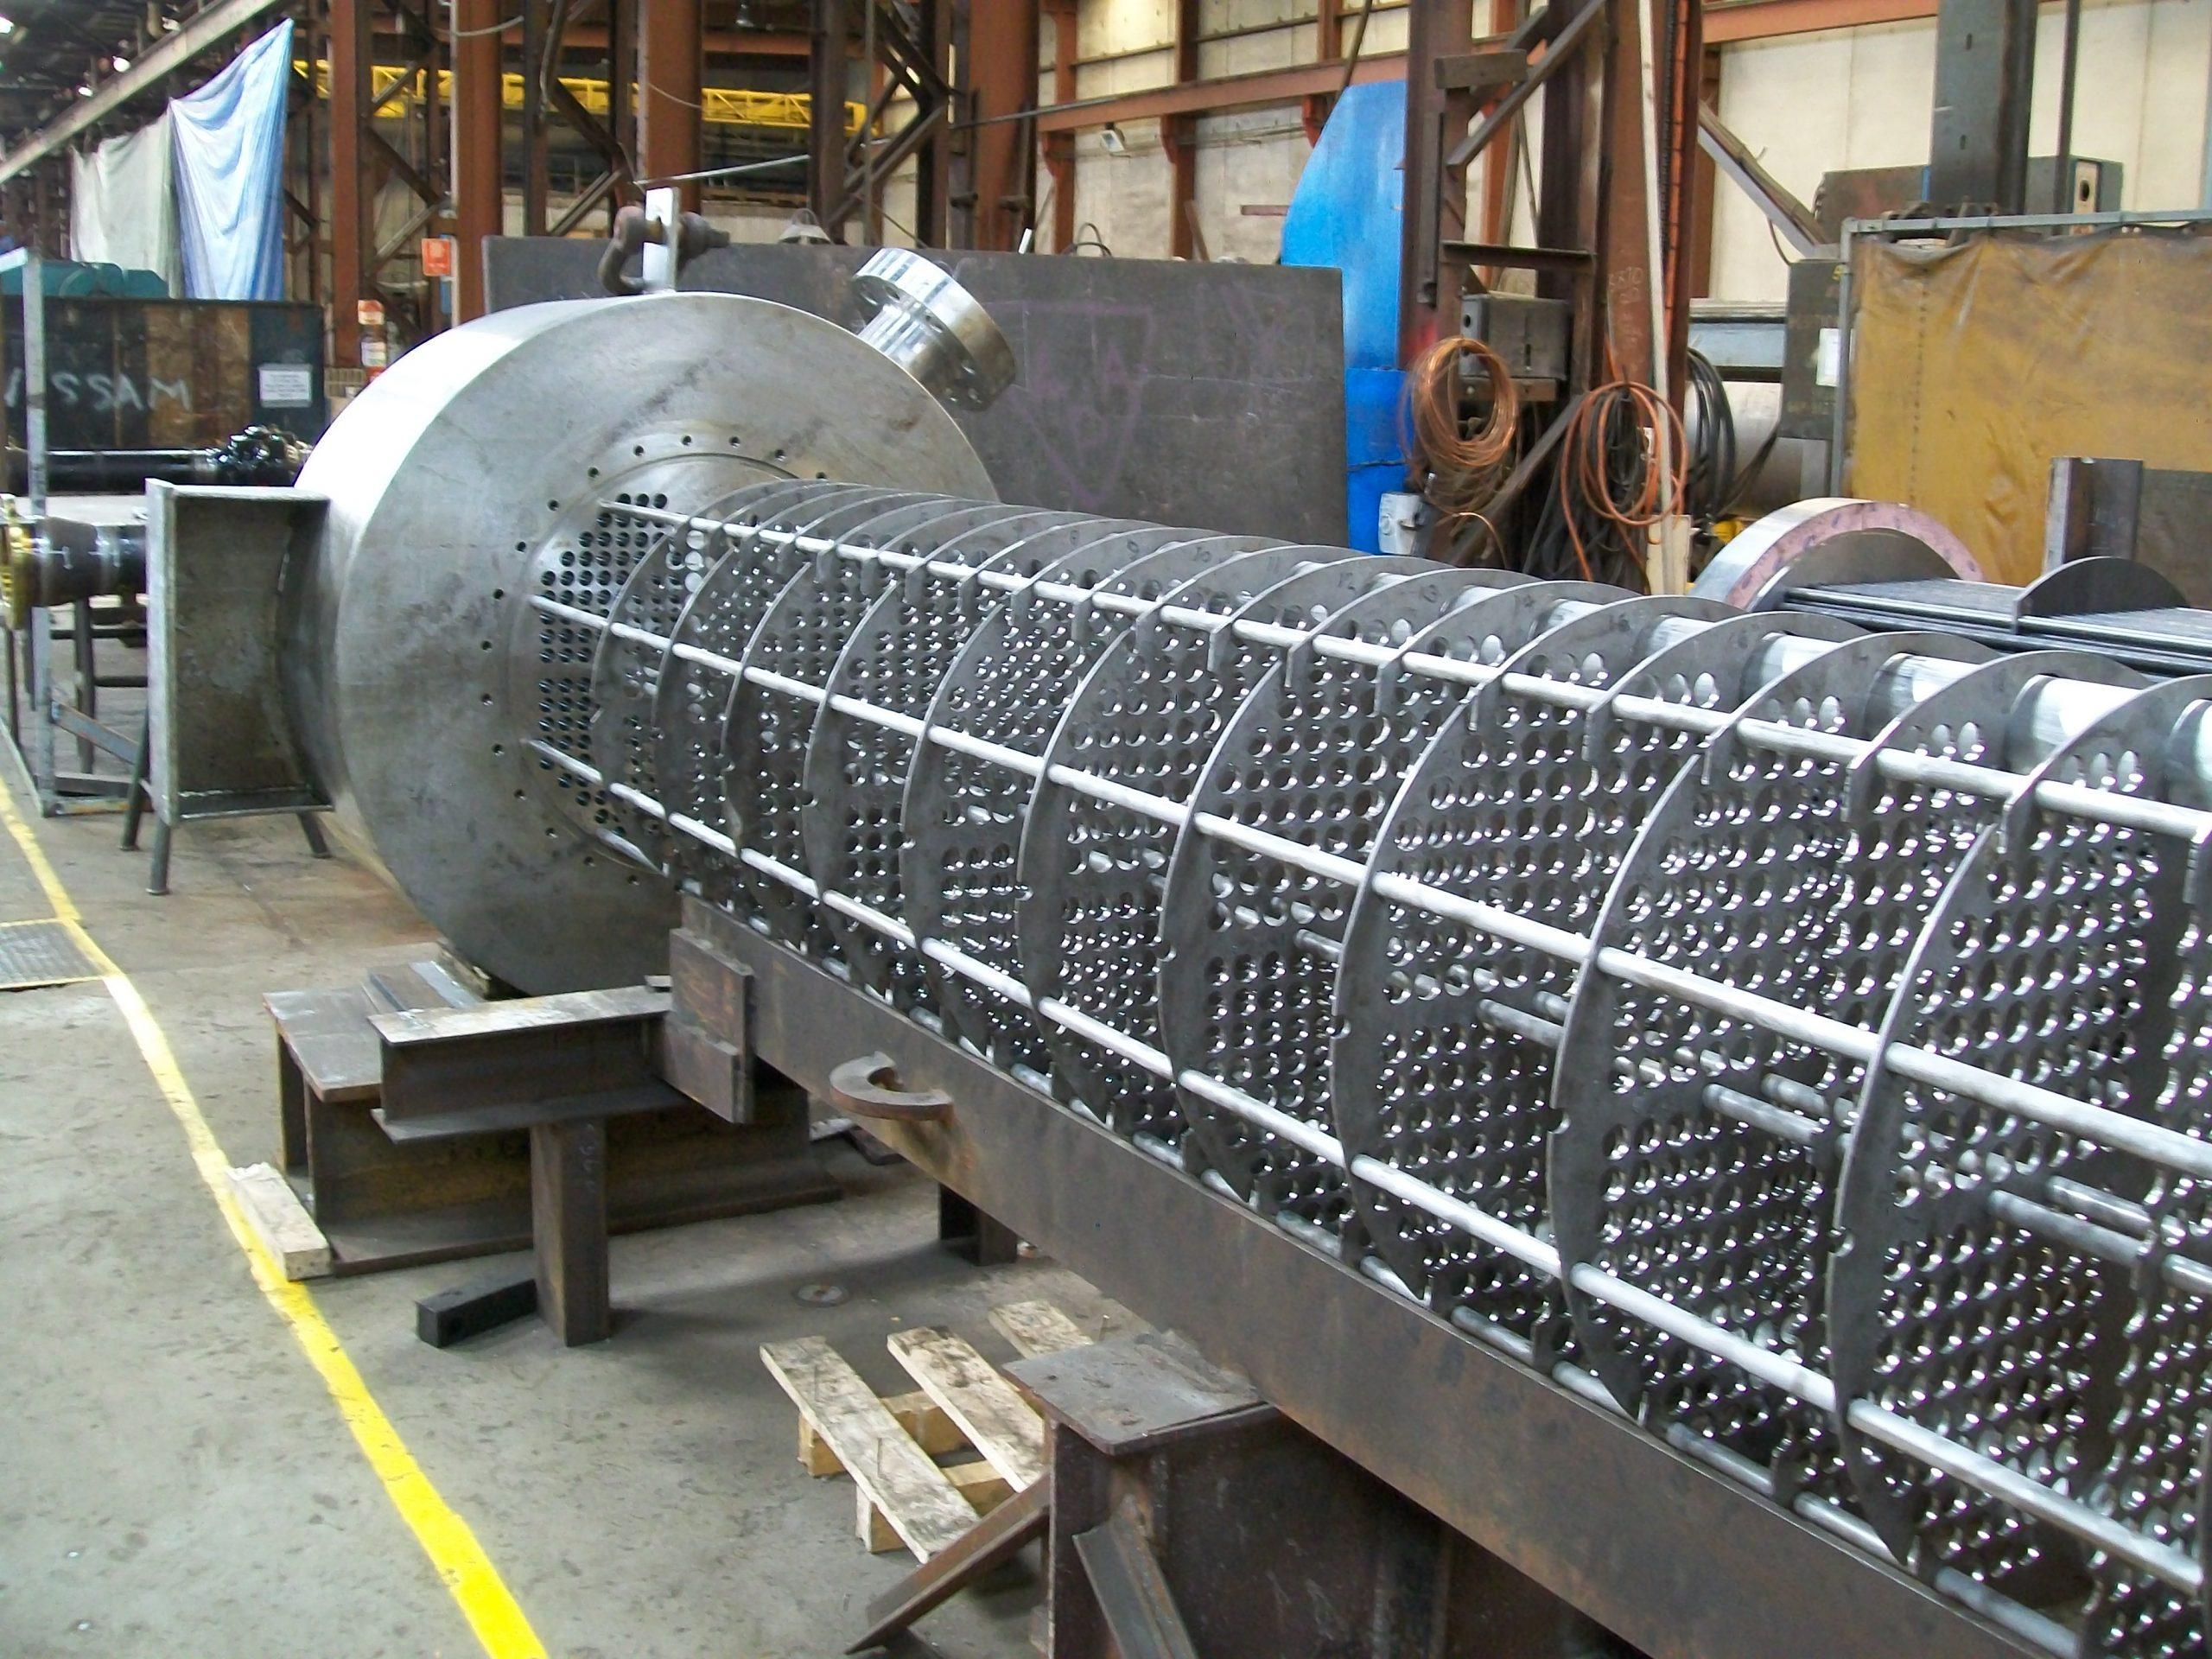 LA2620 - Qld Nickel, Re-tube - 5, Re-assemble bundle ready for tubes (2010-11-18)